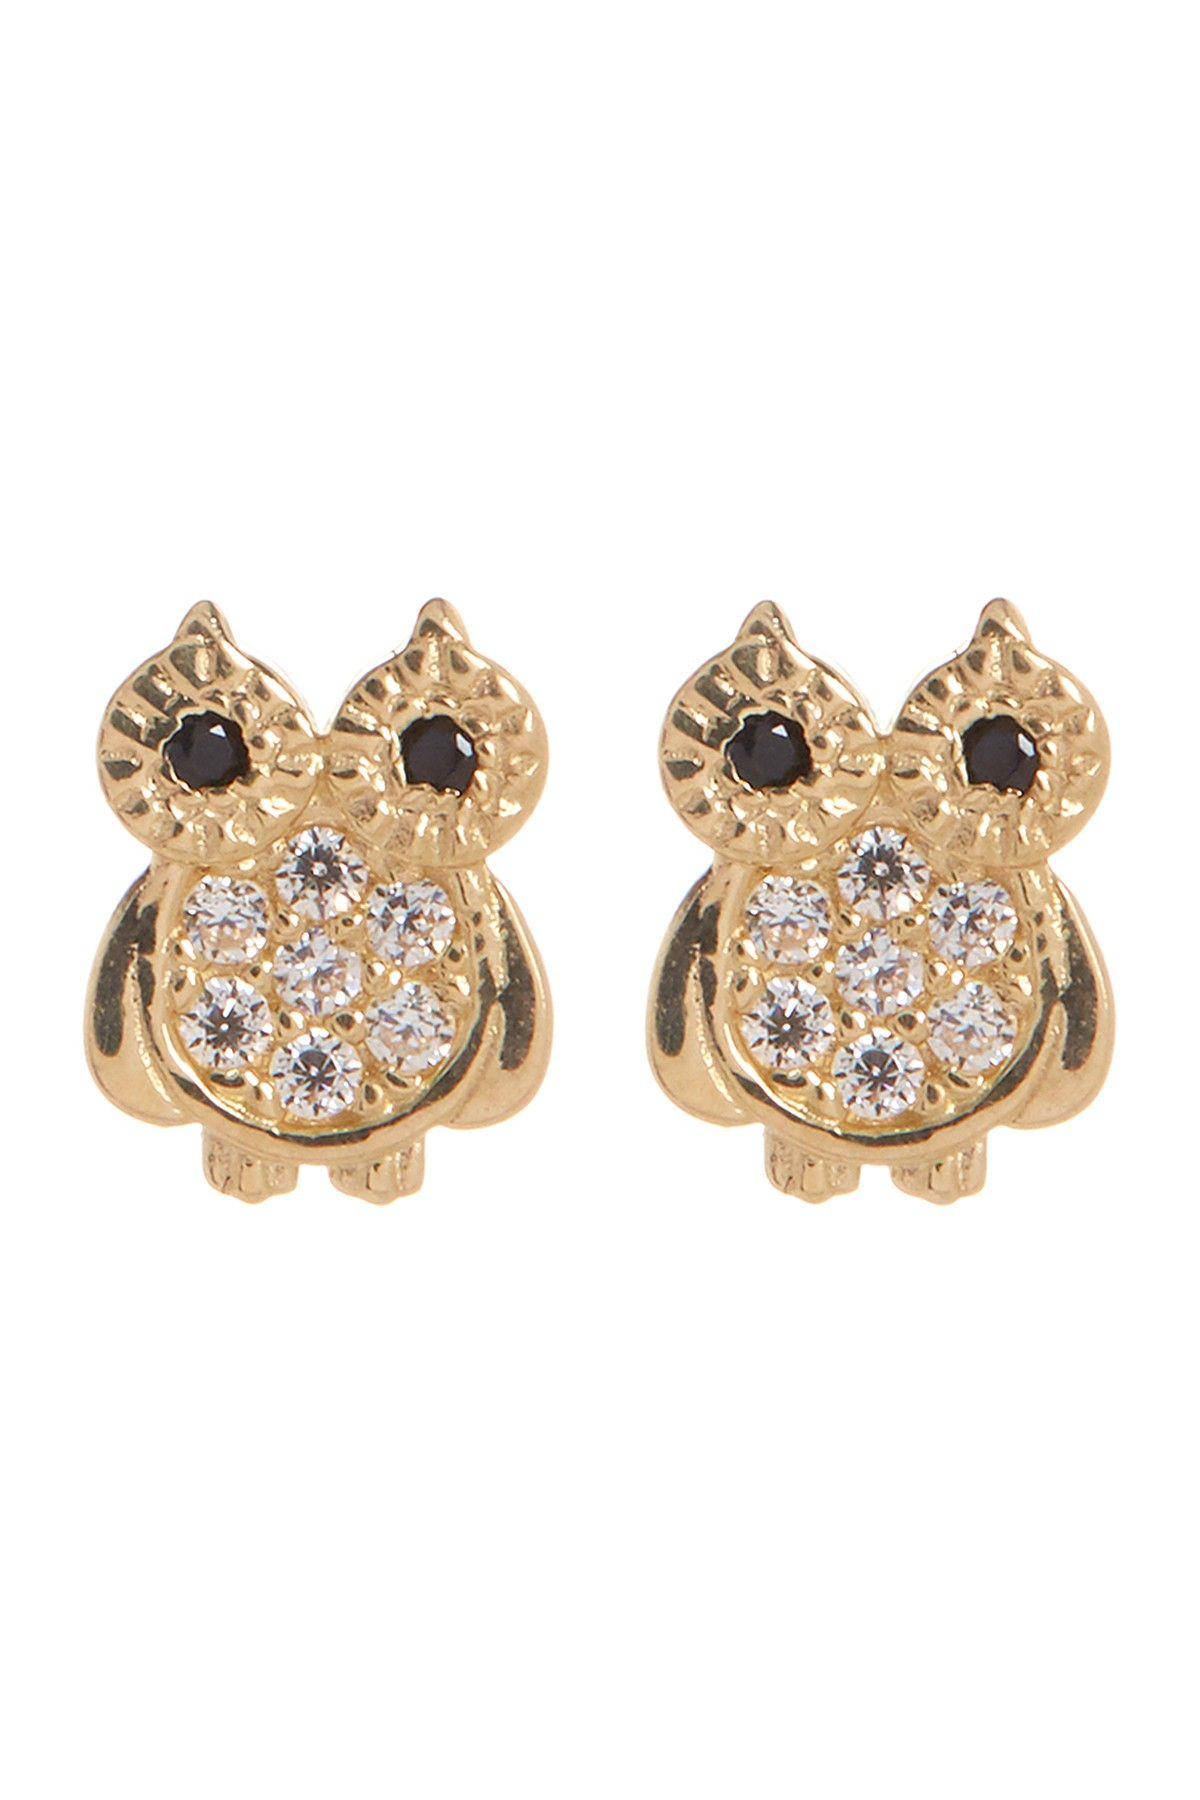 Candela 14K Yellow Gold CZ Body Owl Stud Earrings